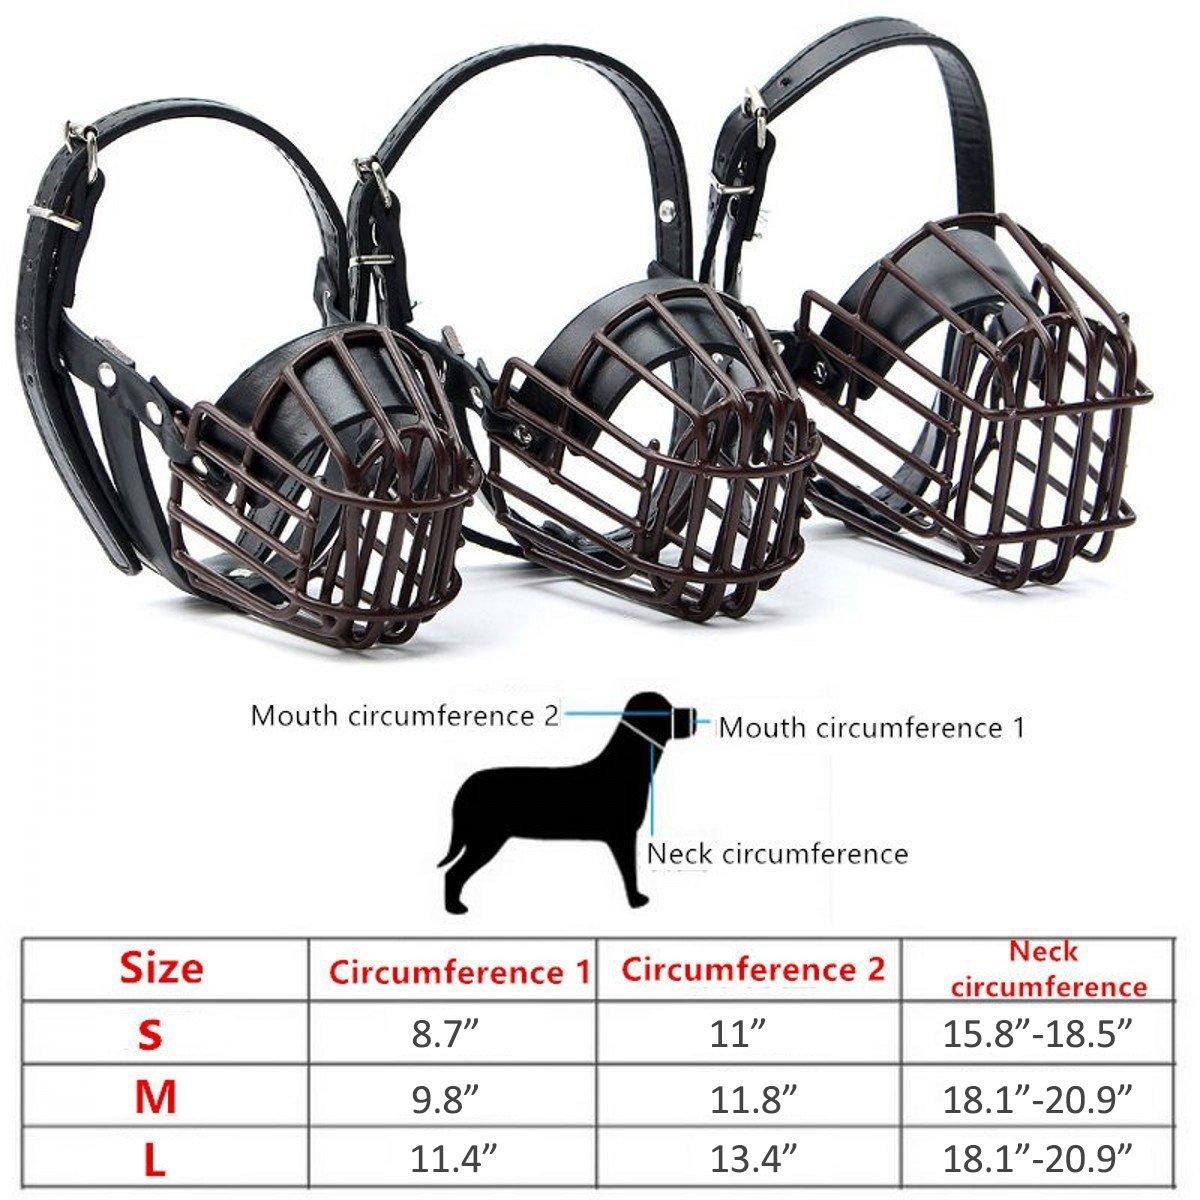 Amazon.com : Dog Muzzle Leather Metal Wire, Focuspet Dog Leather ...